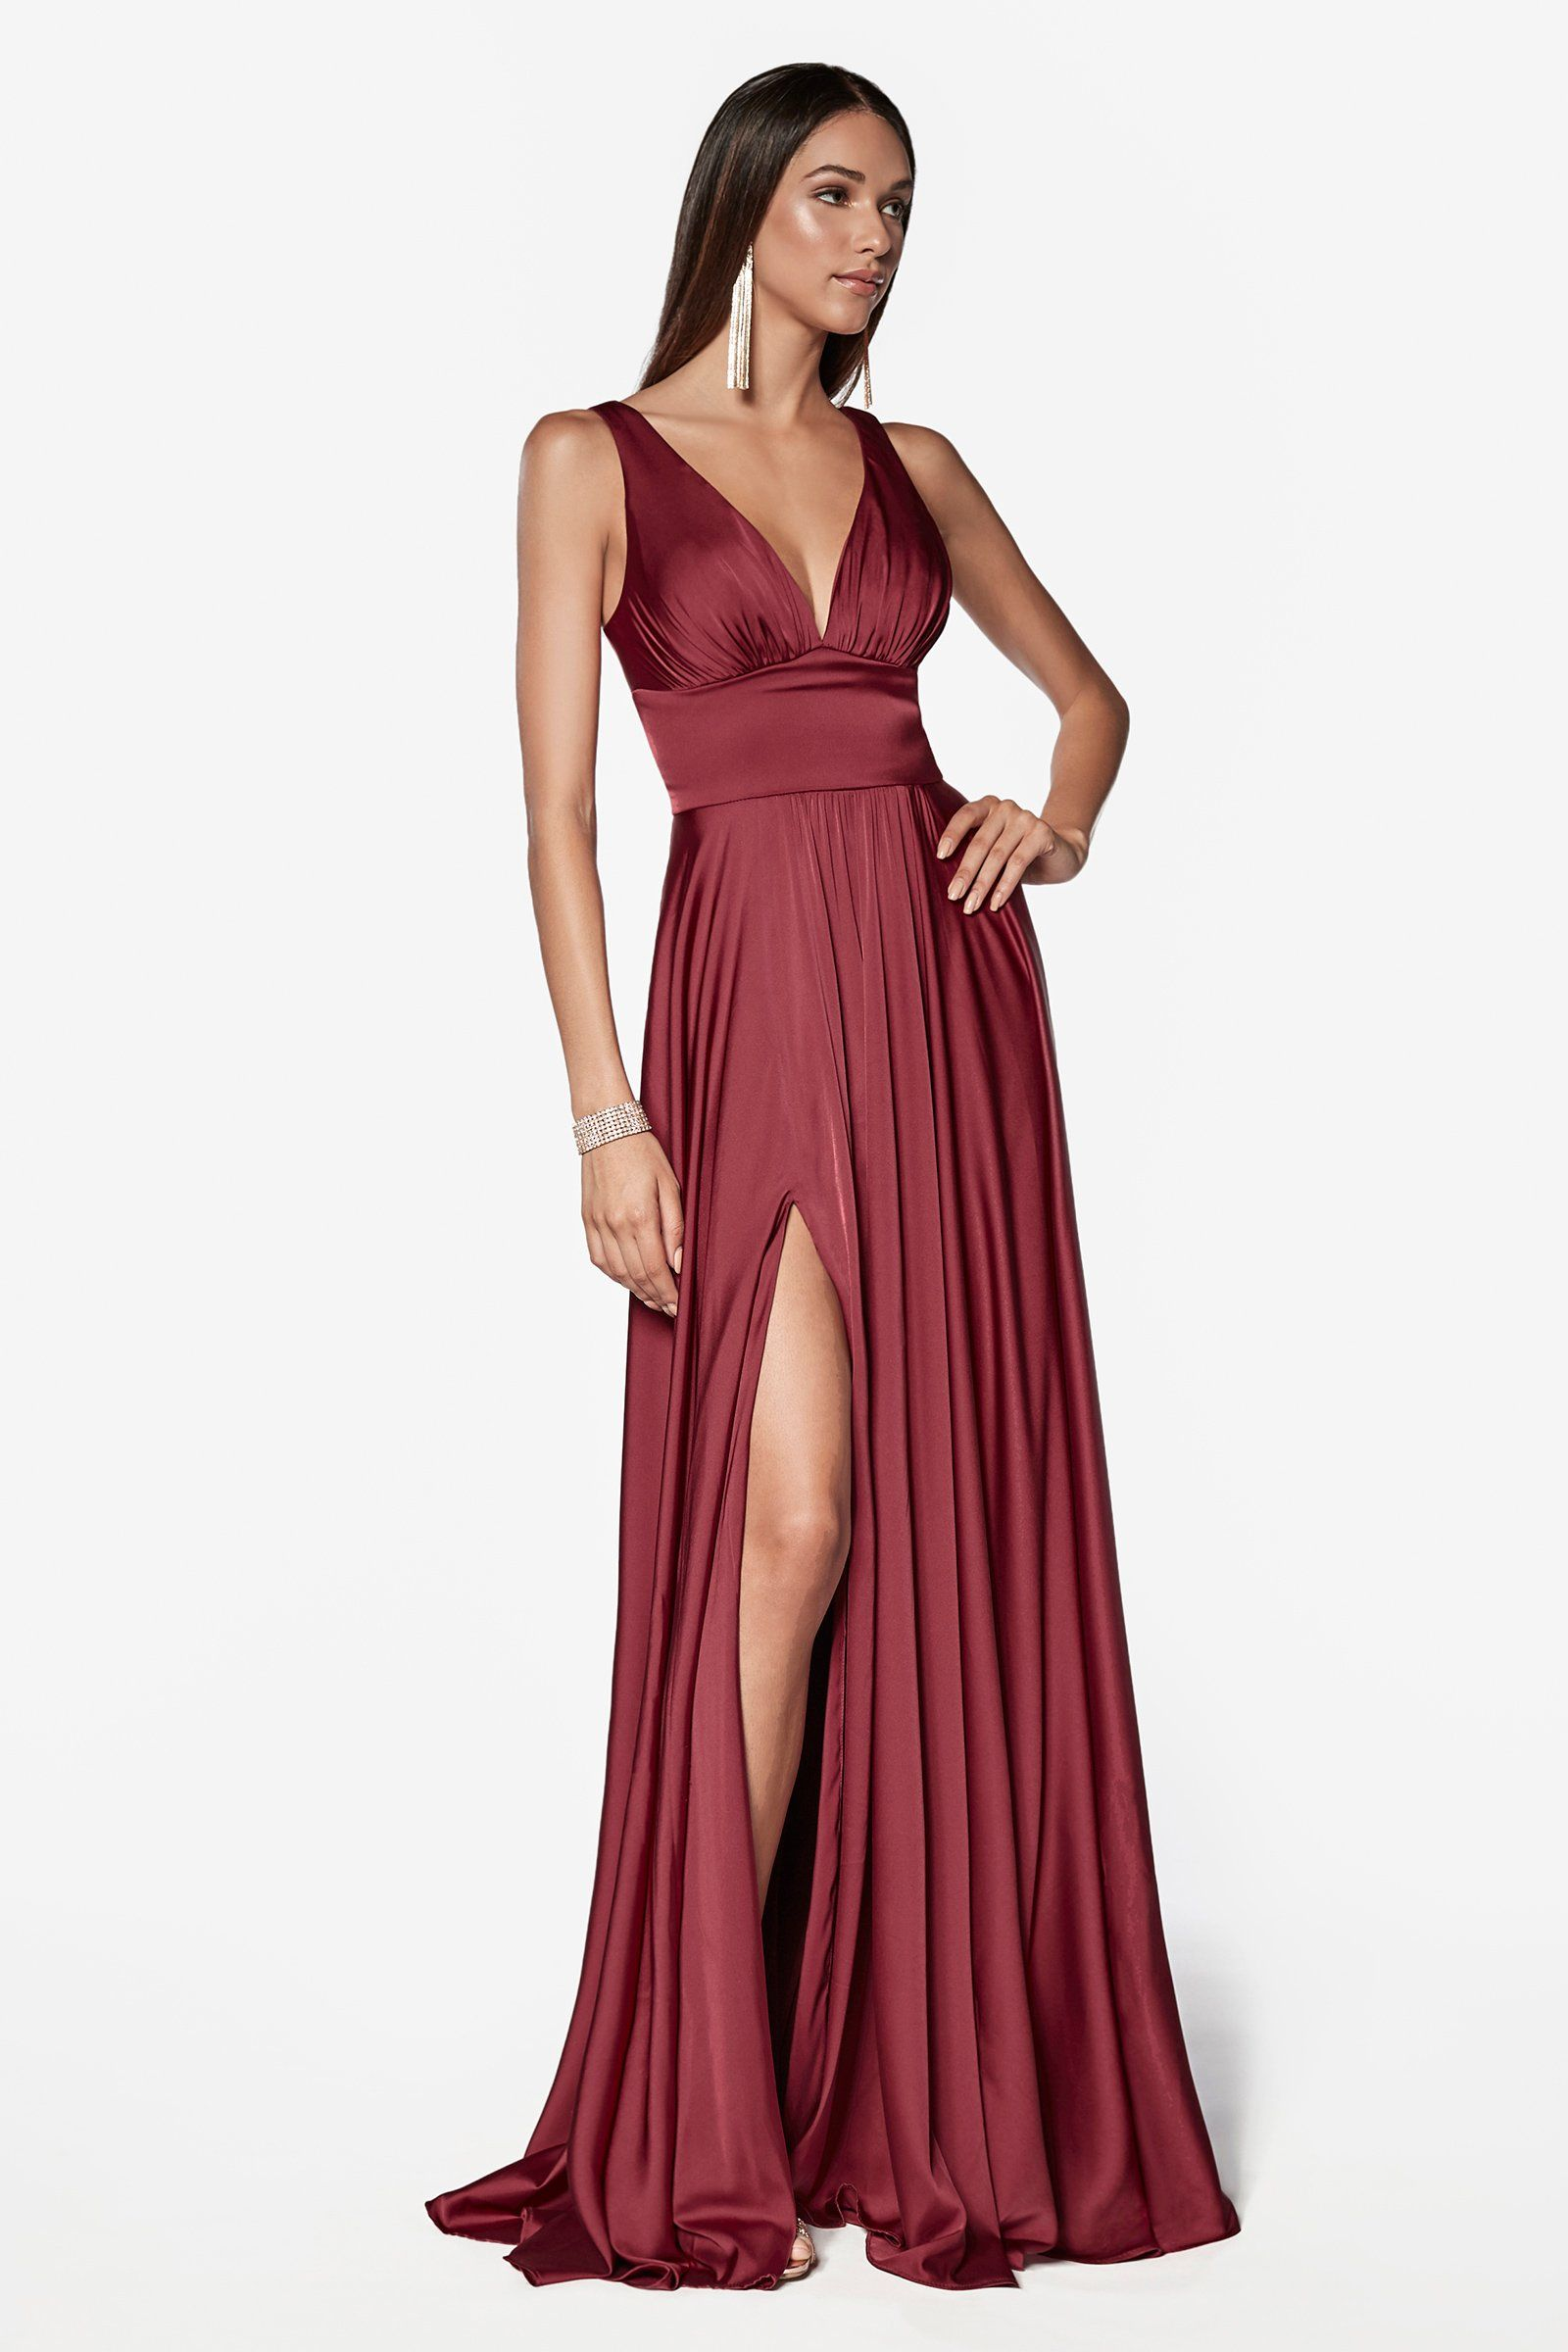 d6c60e2e853 Long Satin V-Neck Dress with Leg Slit by Cinderella Divine 7469 in ...